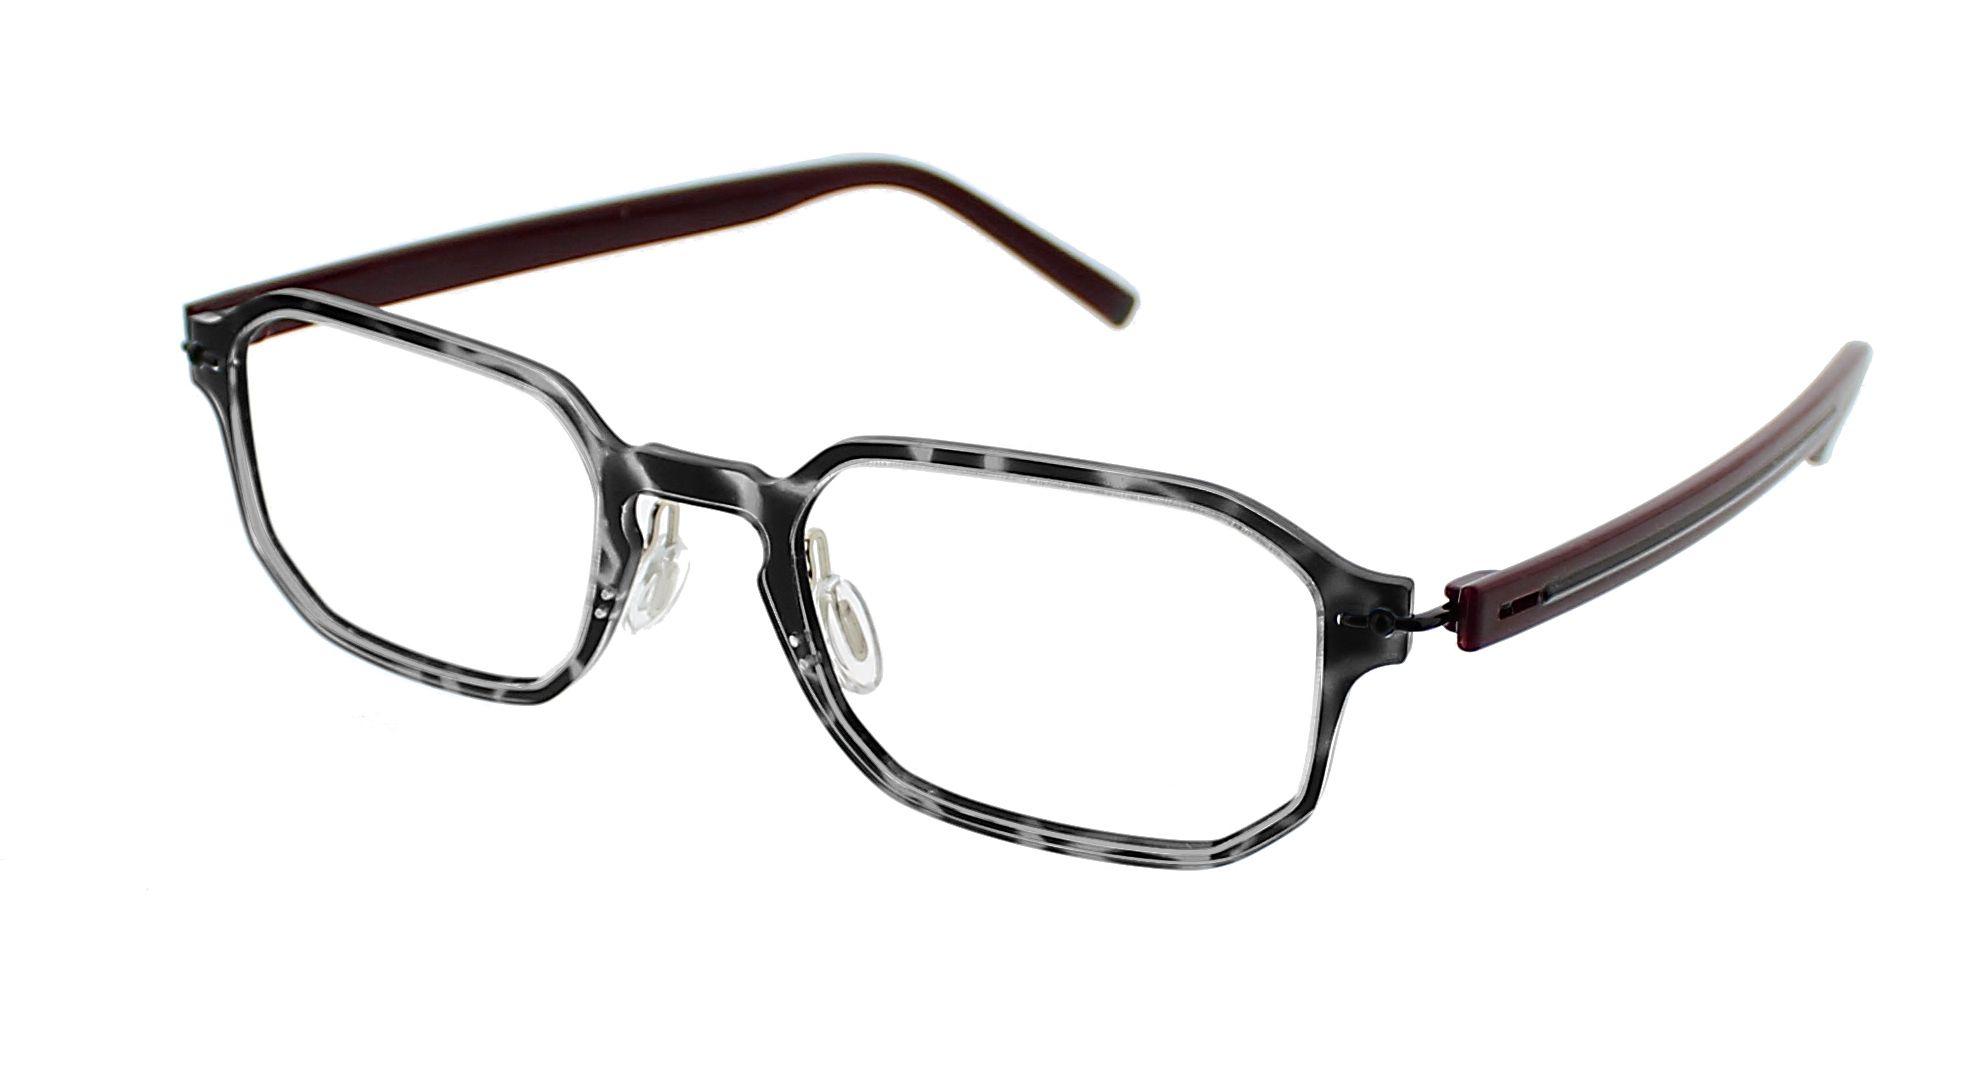 Quick Black Tortoise Aspire Products Aspire, Eyewear